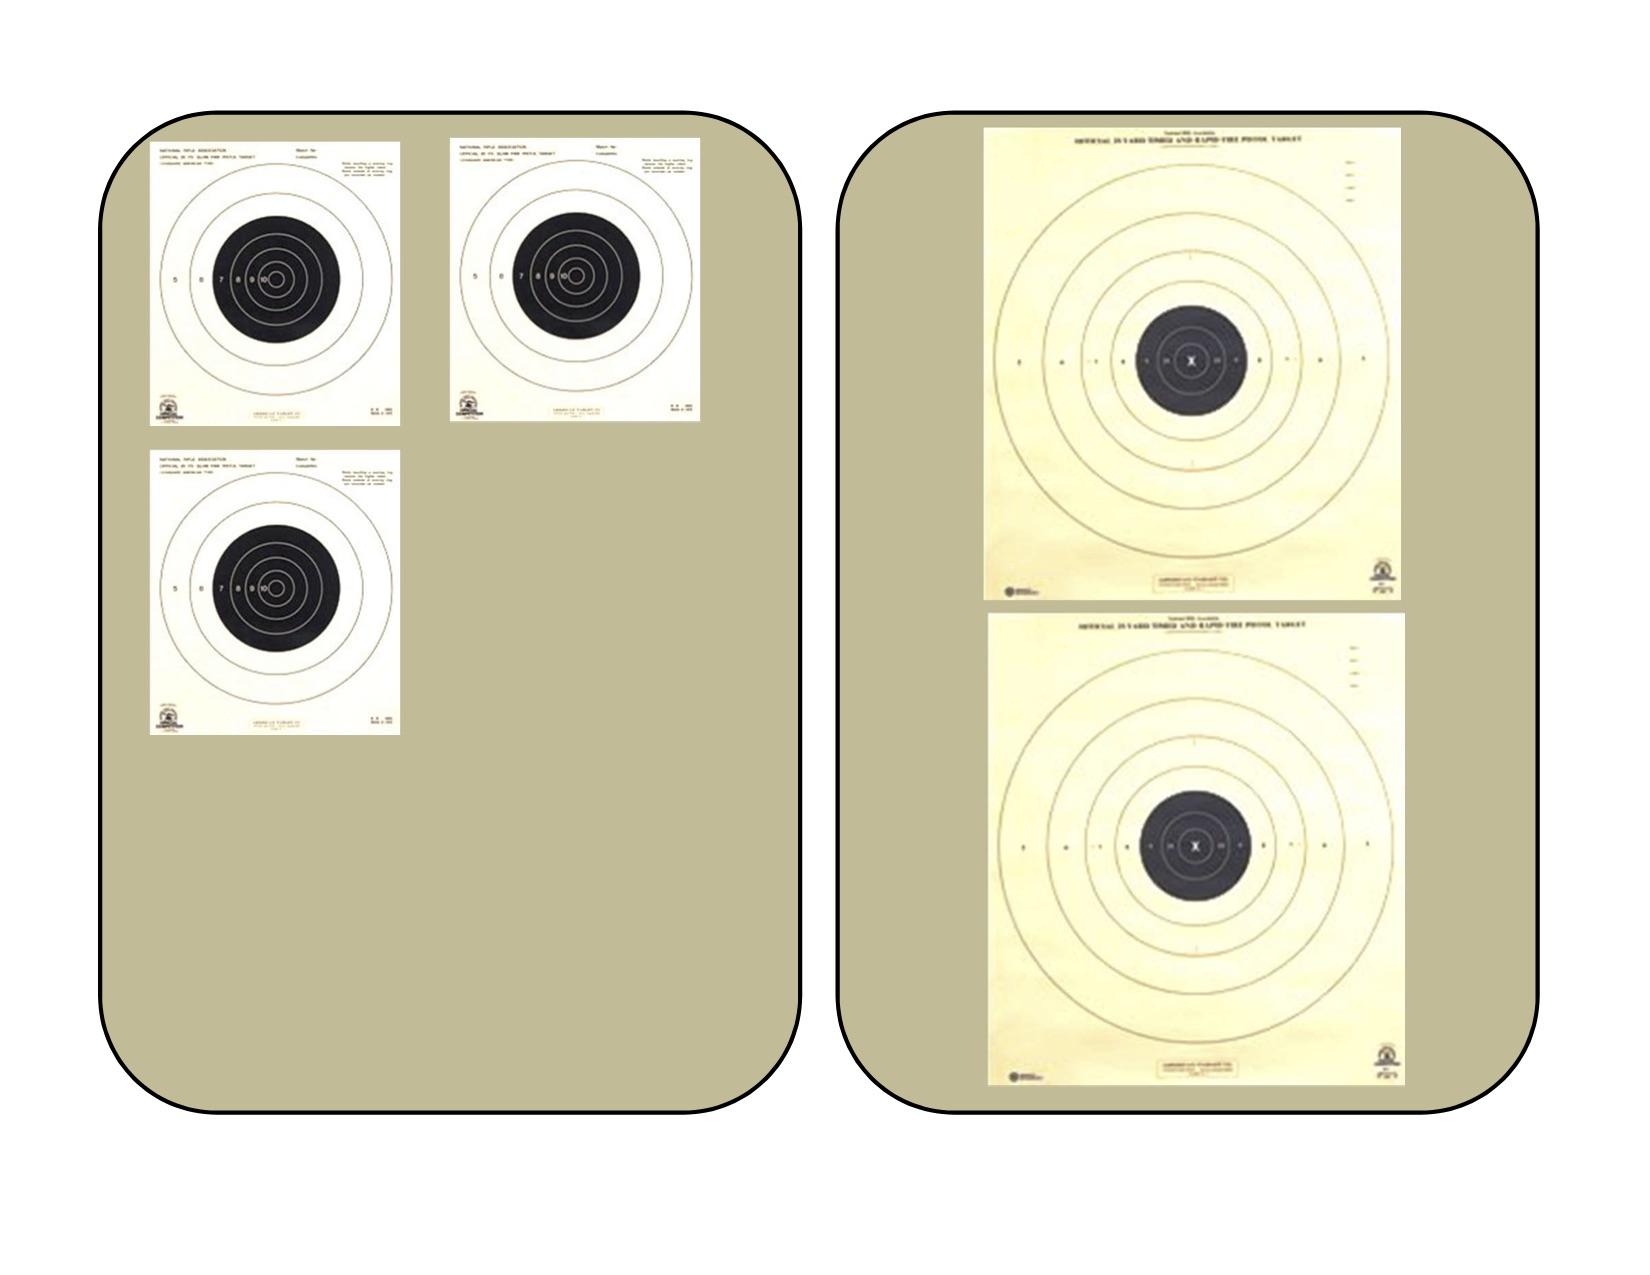 Bullseye Setup